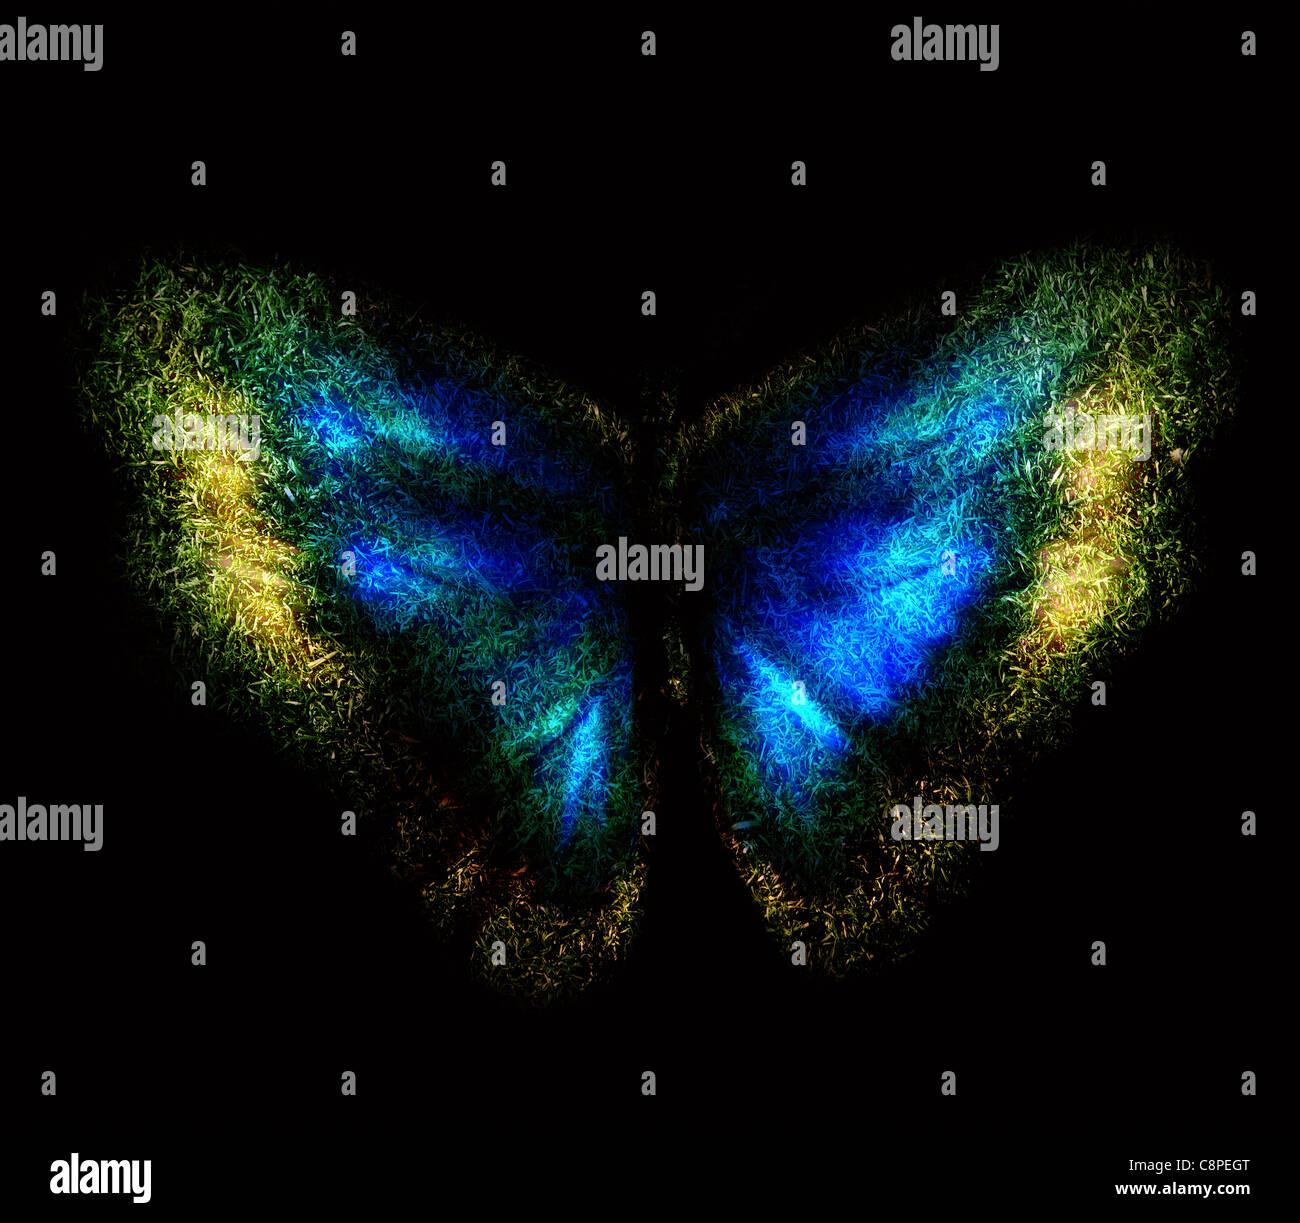 Resumen de mariposas azules sobre fondo negro Imagen De Stock